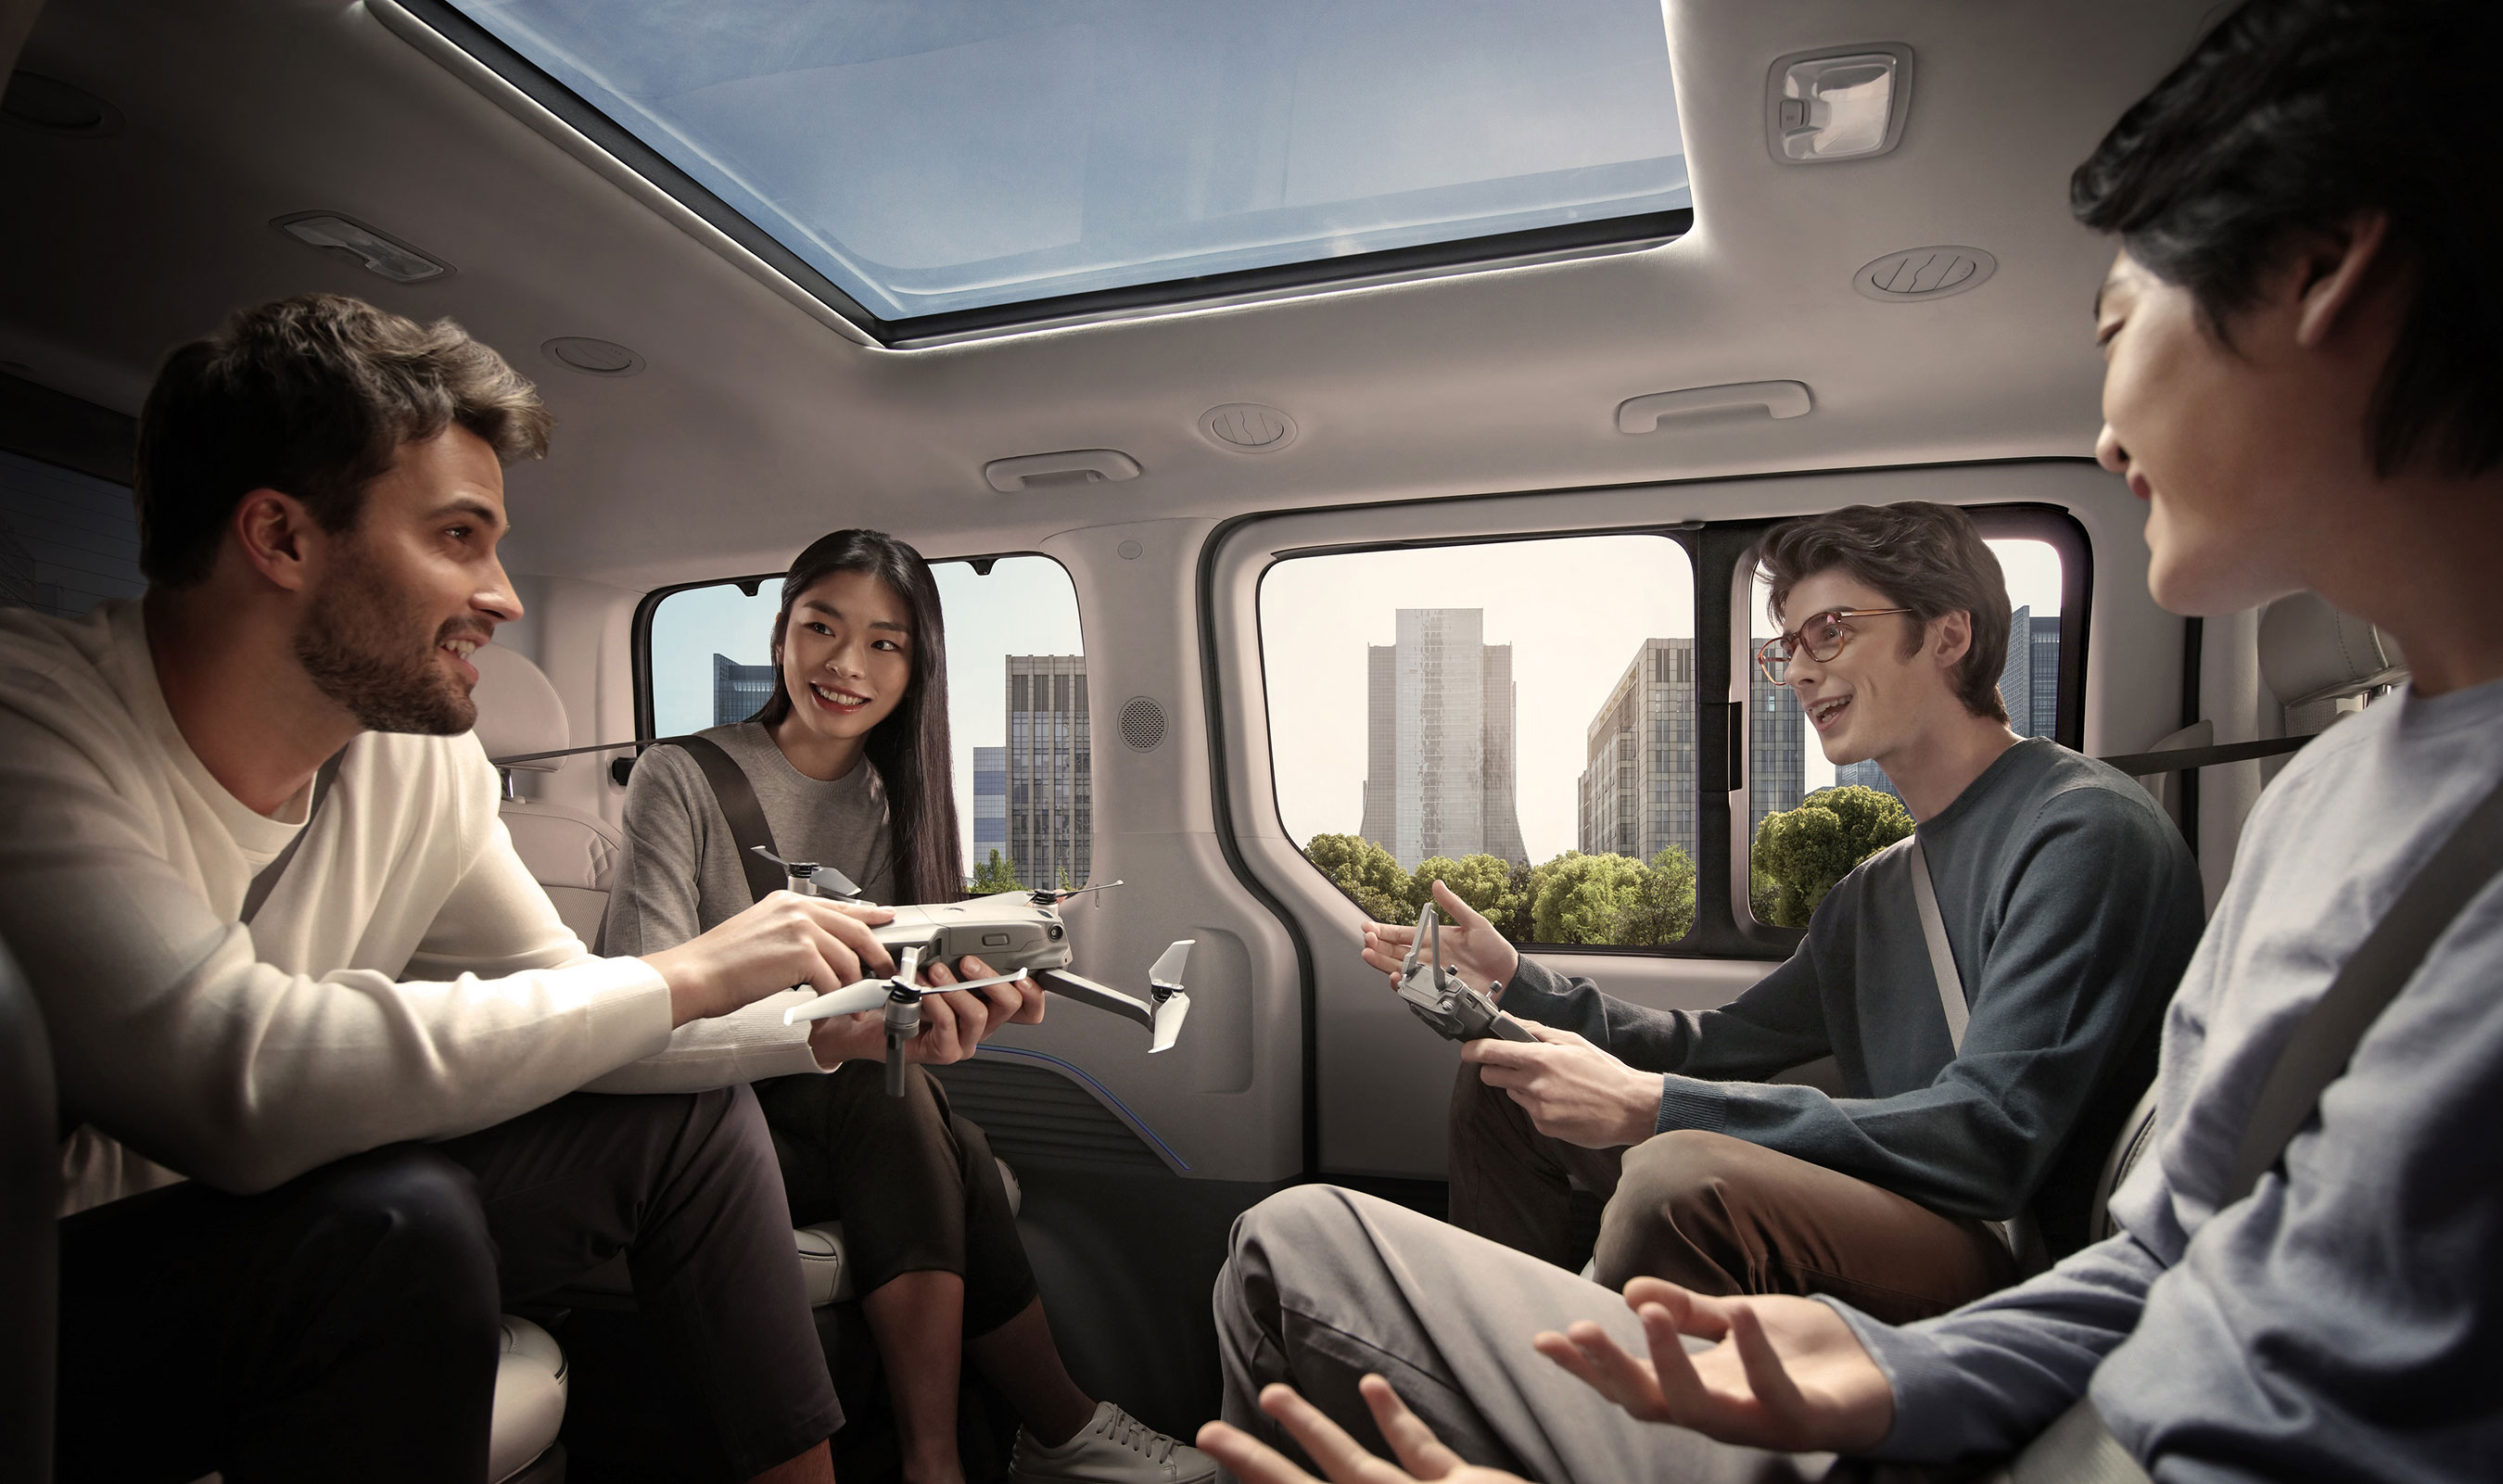 Hyundai Motor officially launches new STARIA multi-purpose vehicle (MPV), establishing a model for its future Purpose Built Vehicles